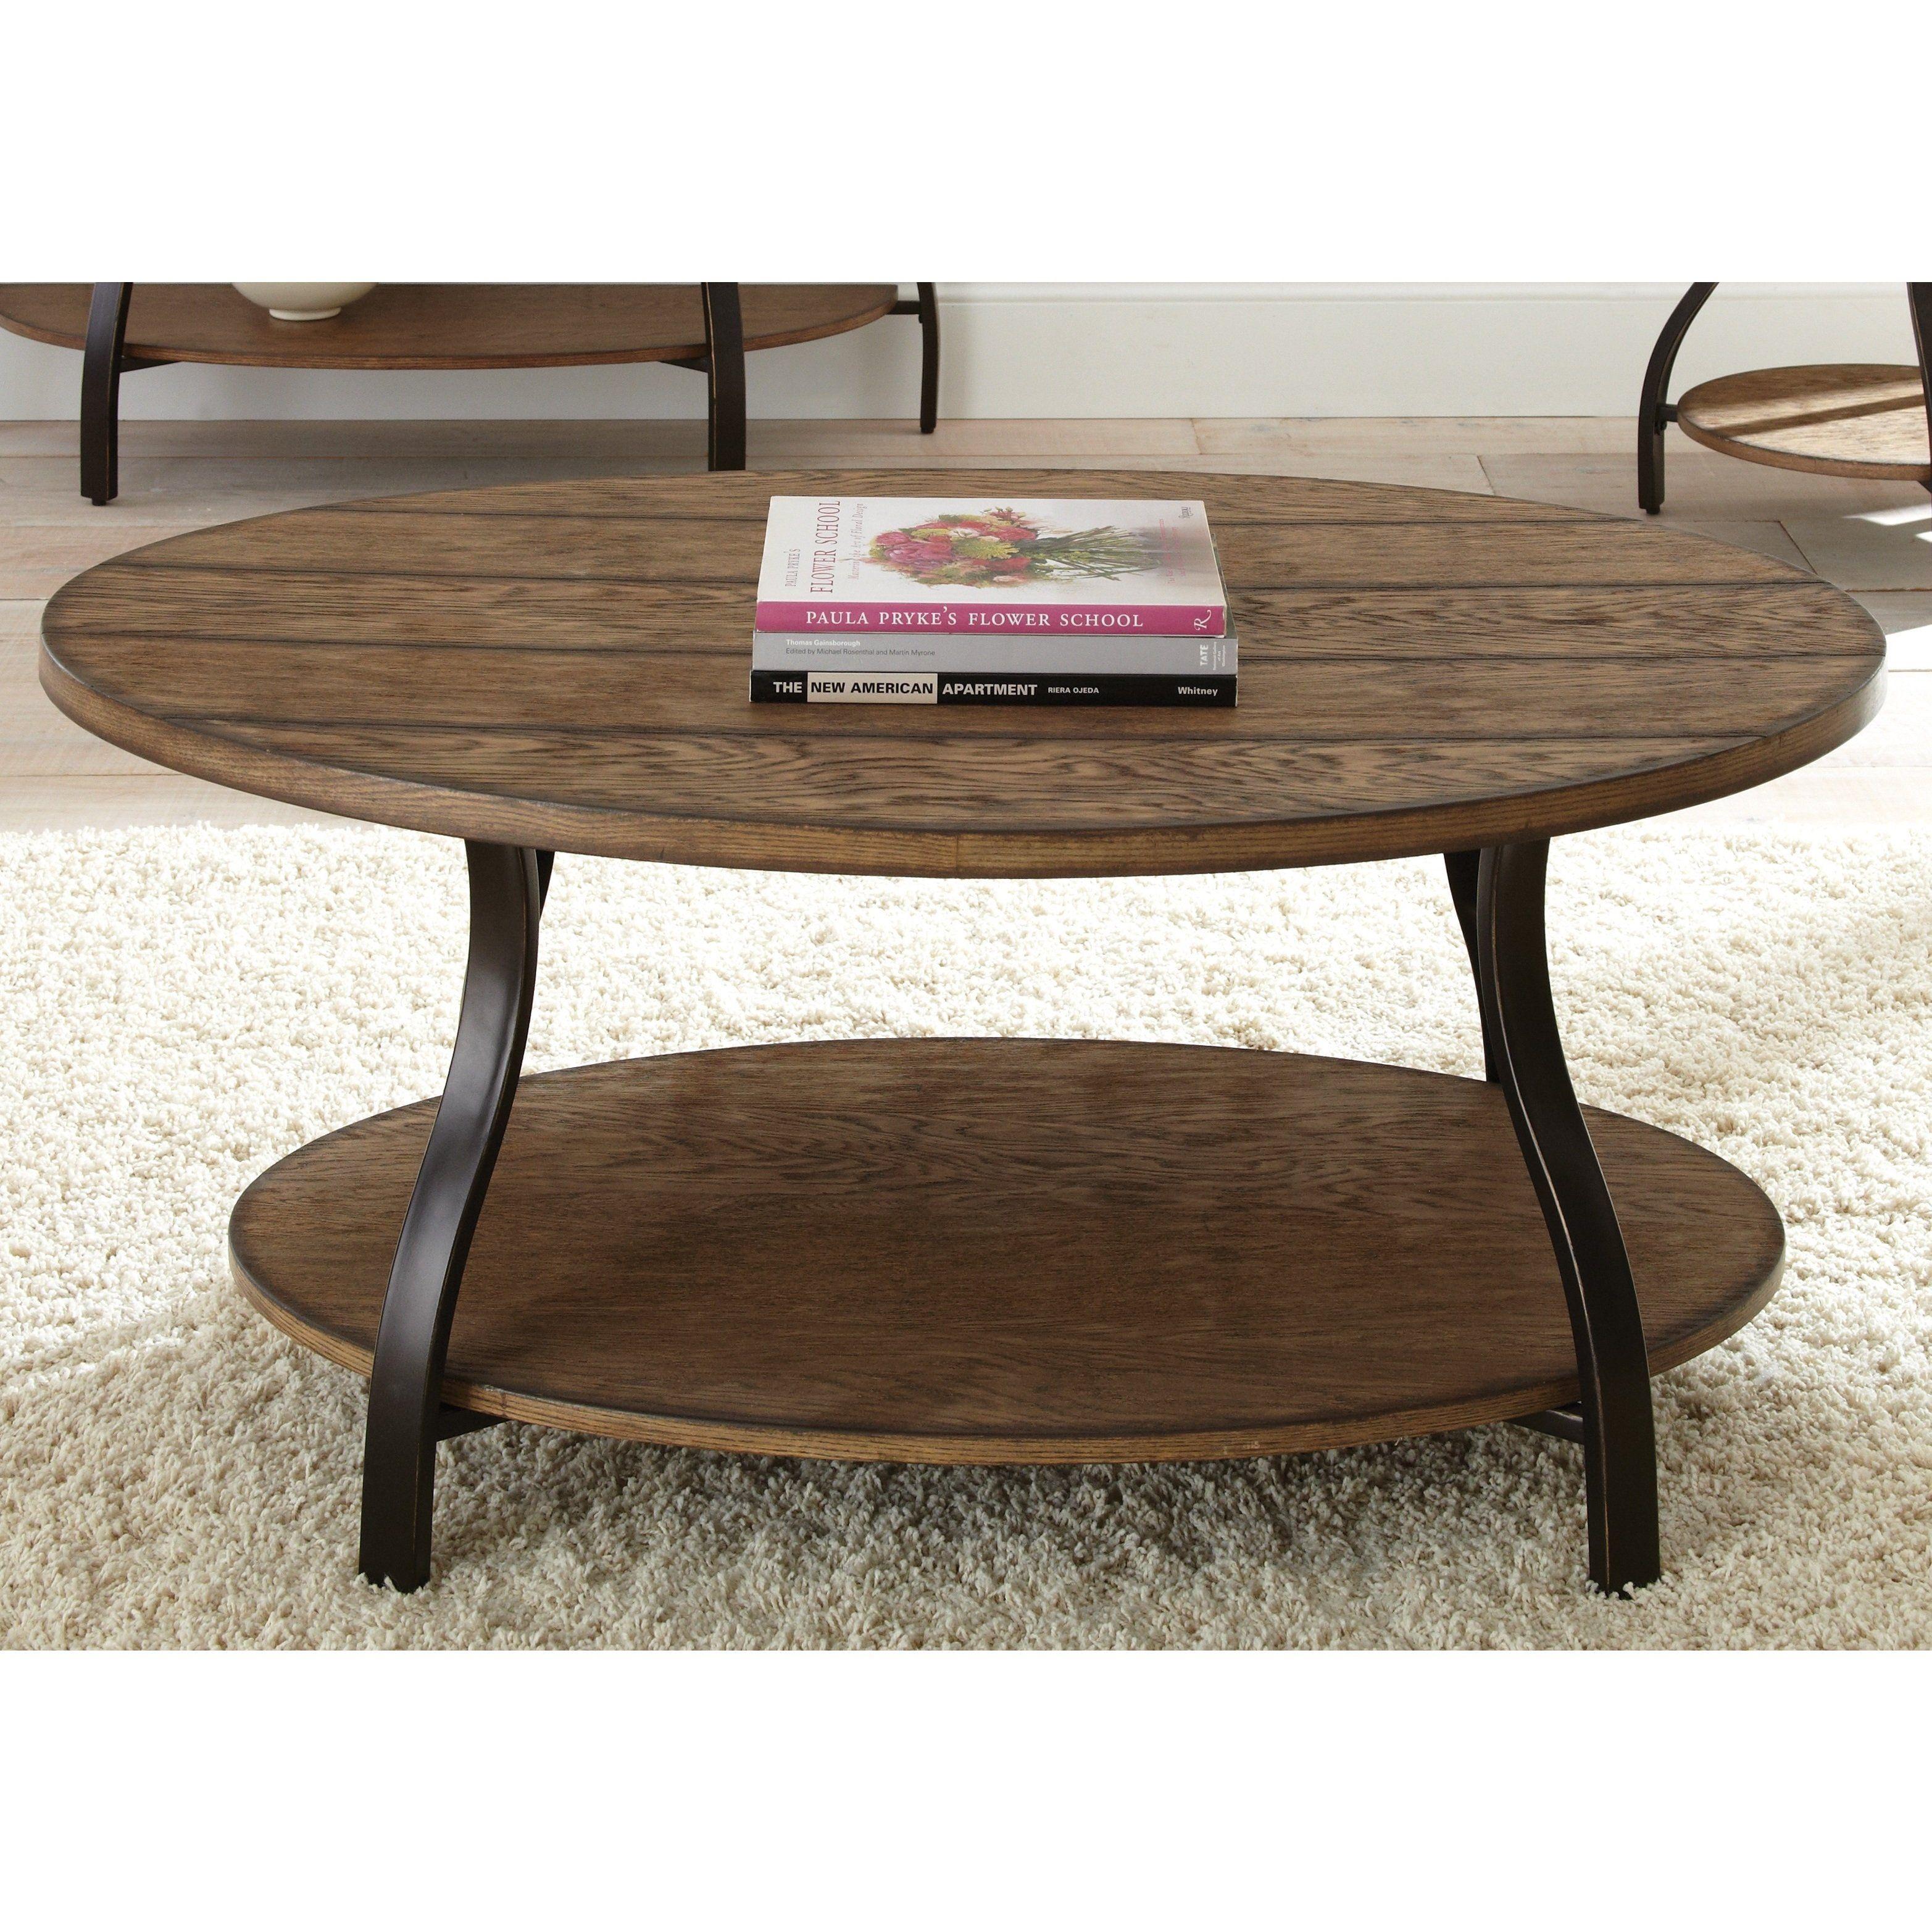 The Gray Barn Abernathy Oval Wood And Metal Coffee Table 21 H X